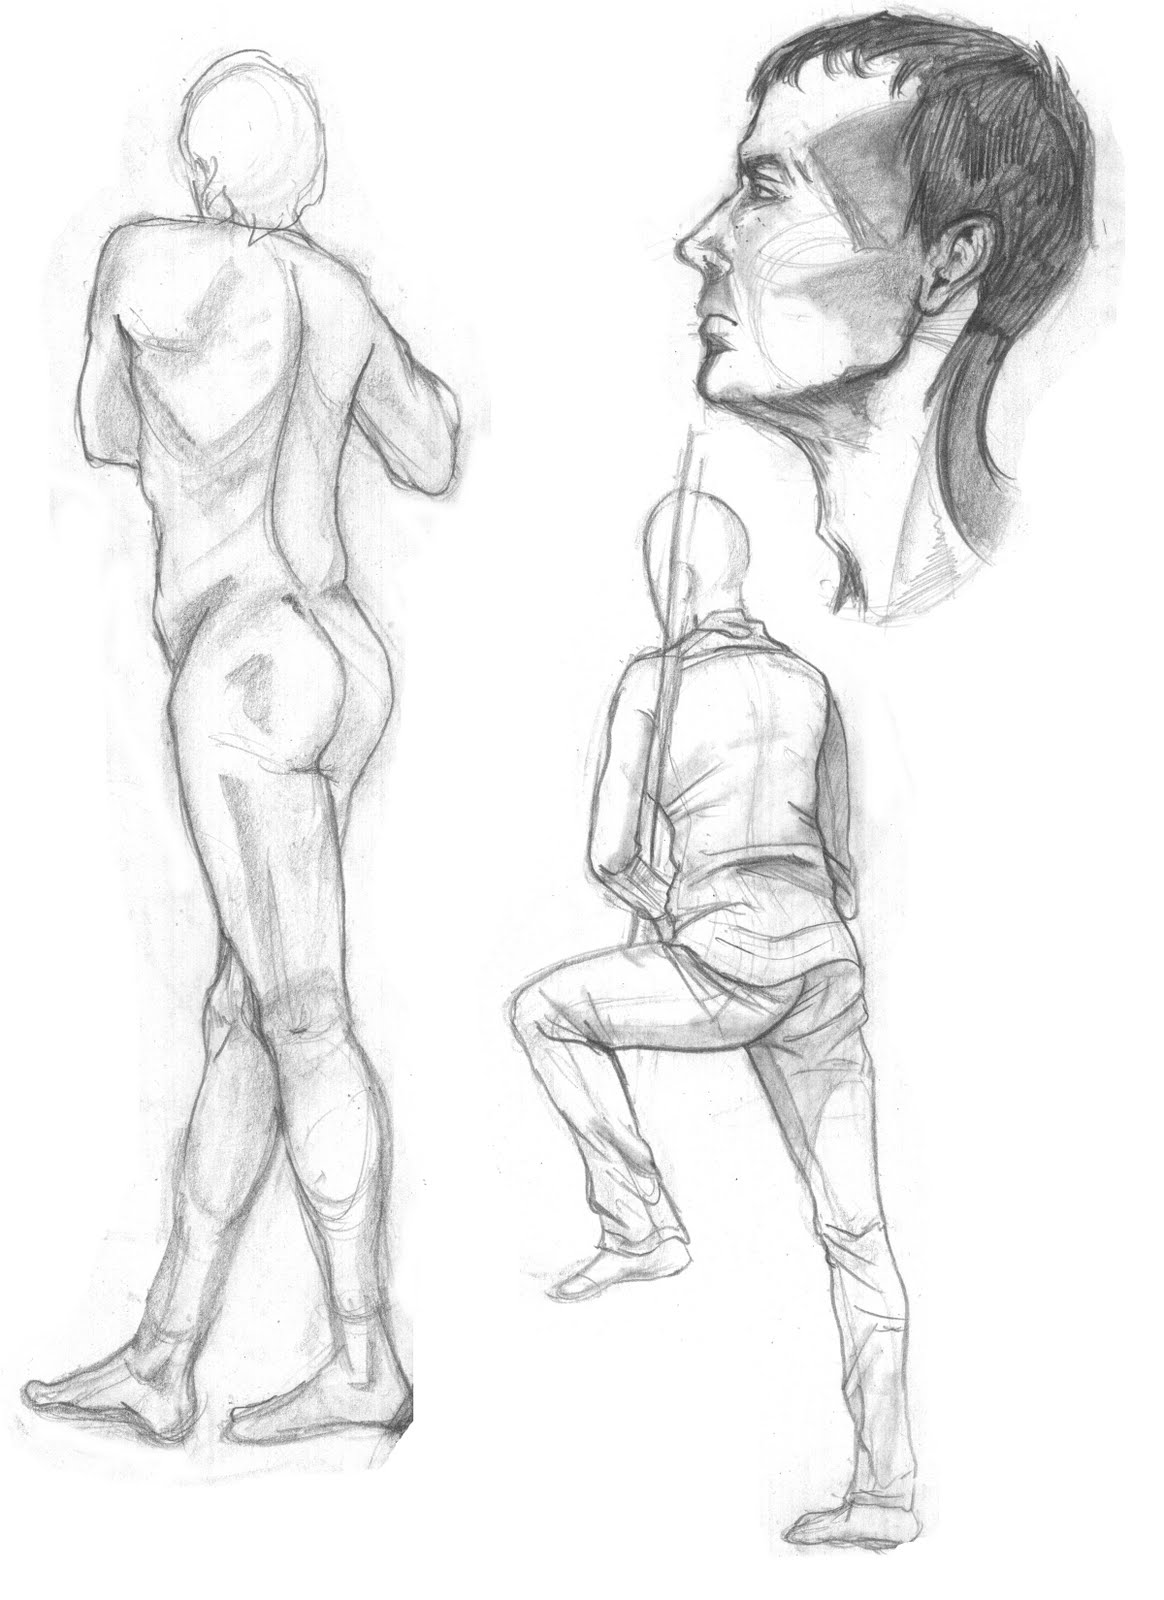 2d Character Design Course : Christina worden mauslein d character design and